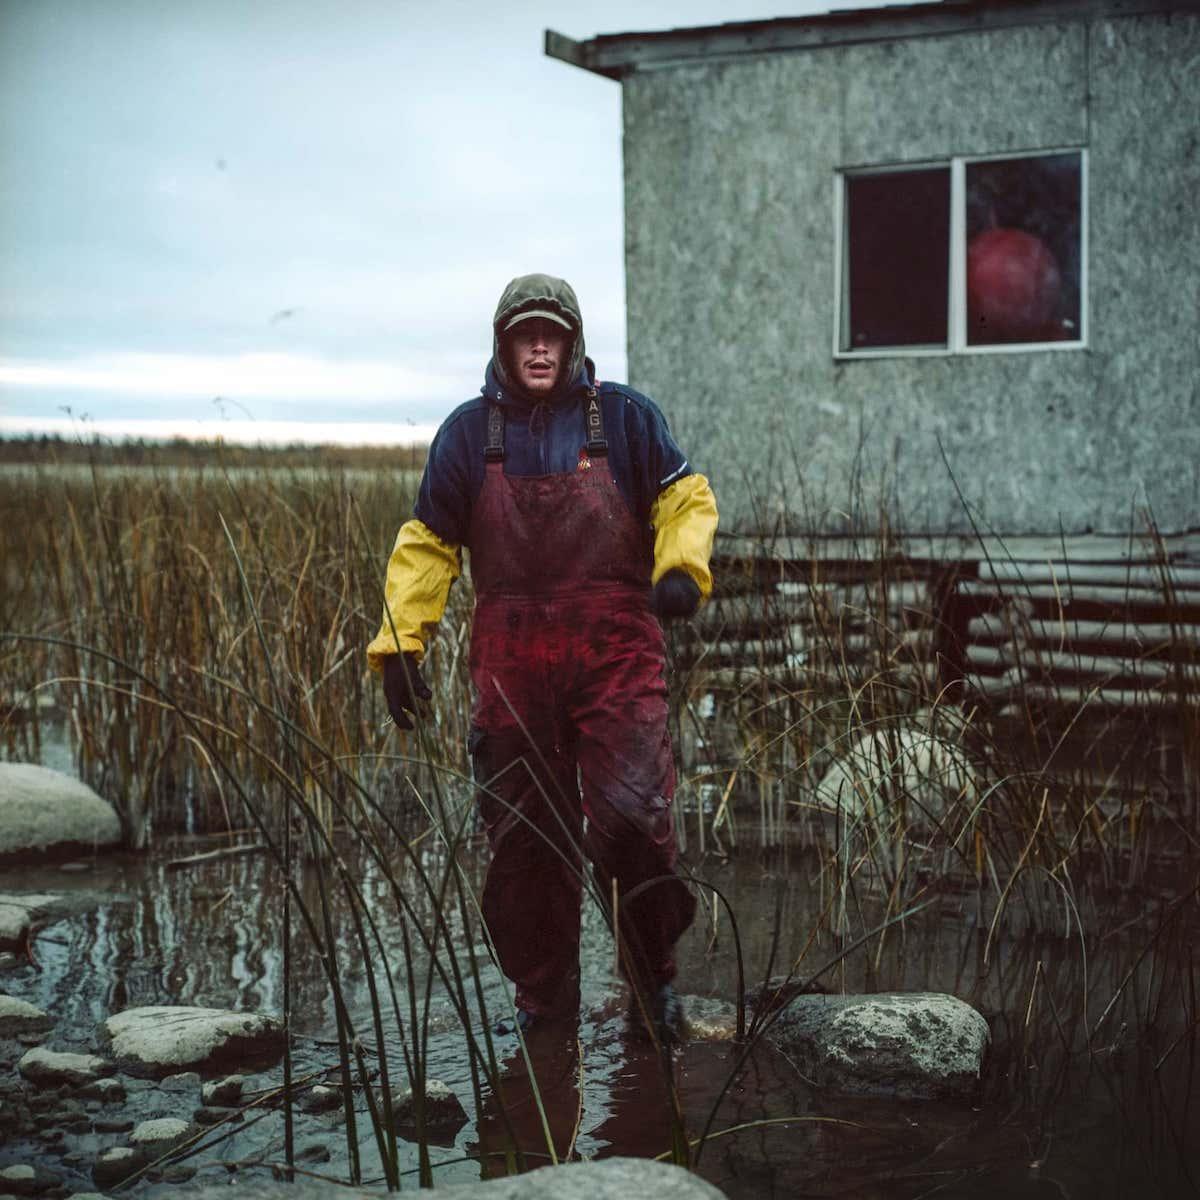 Fisherman's helper Murdock Saunders during his work day fishing